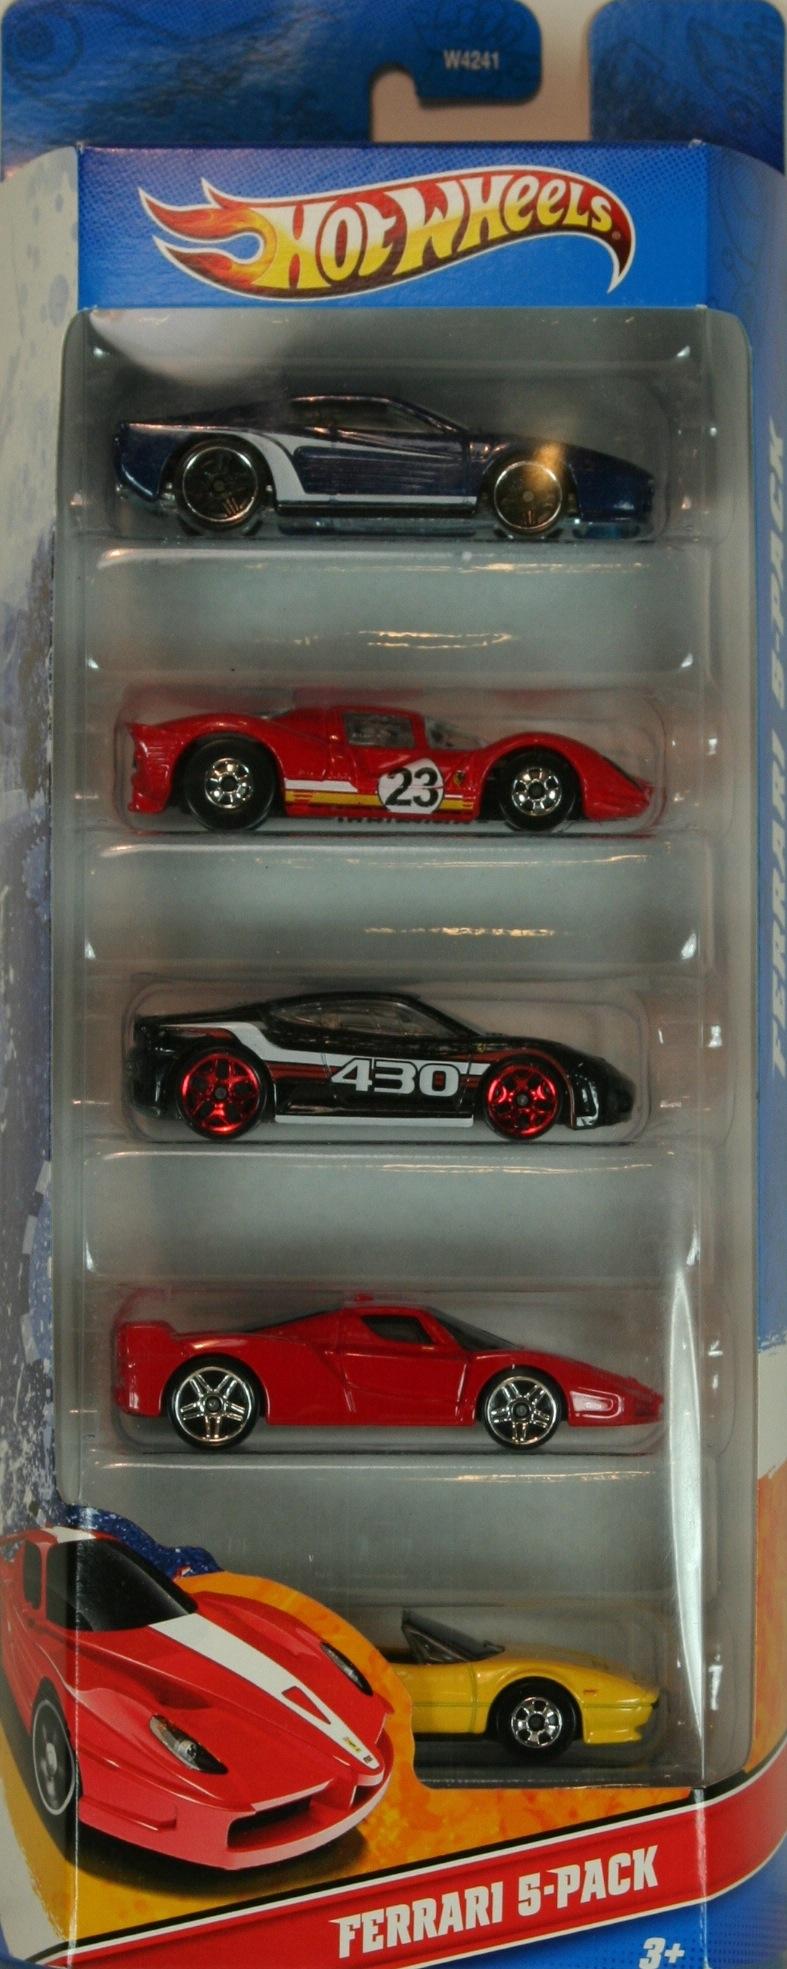 Ferrari 5 5-Pack (2012-1)